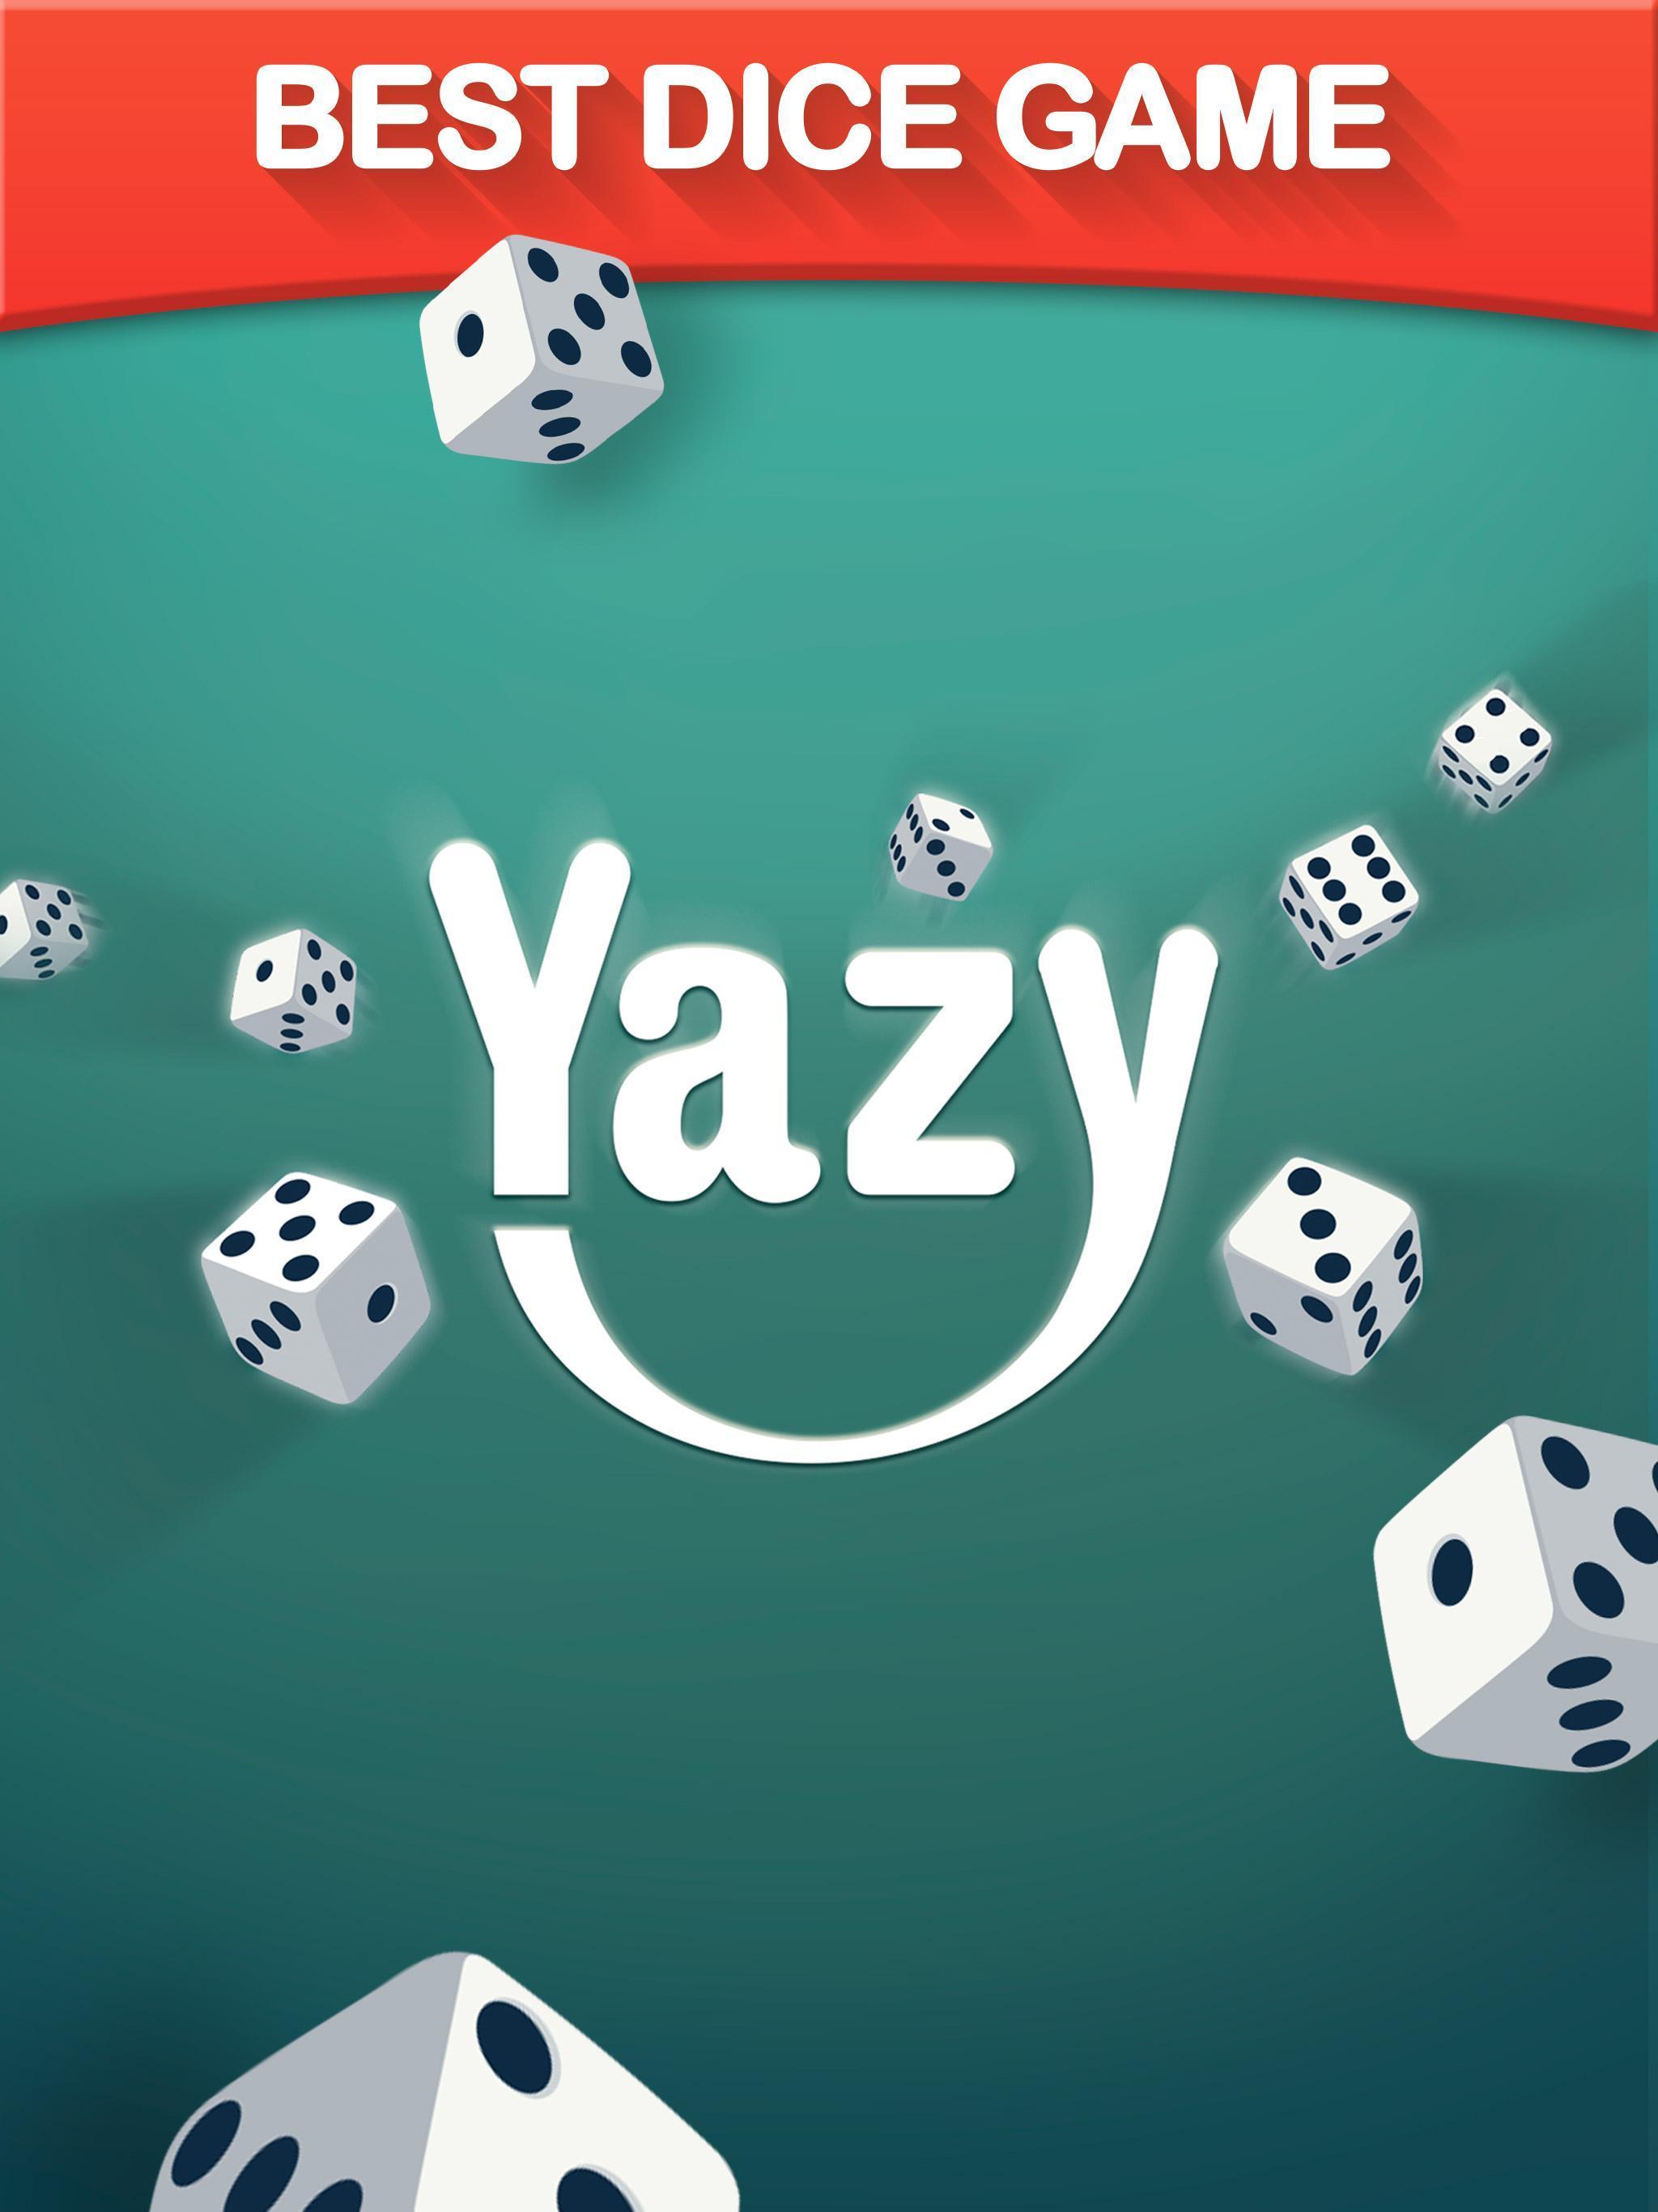 Yazy the best yatzy dice game 1.0.36 Screenshot 15